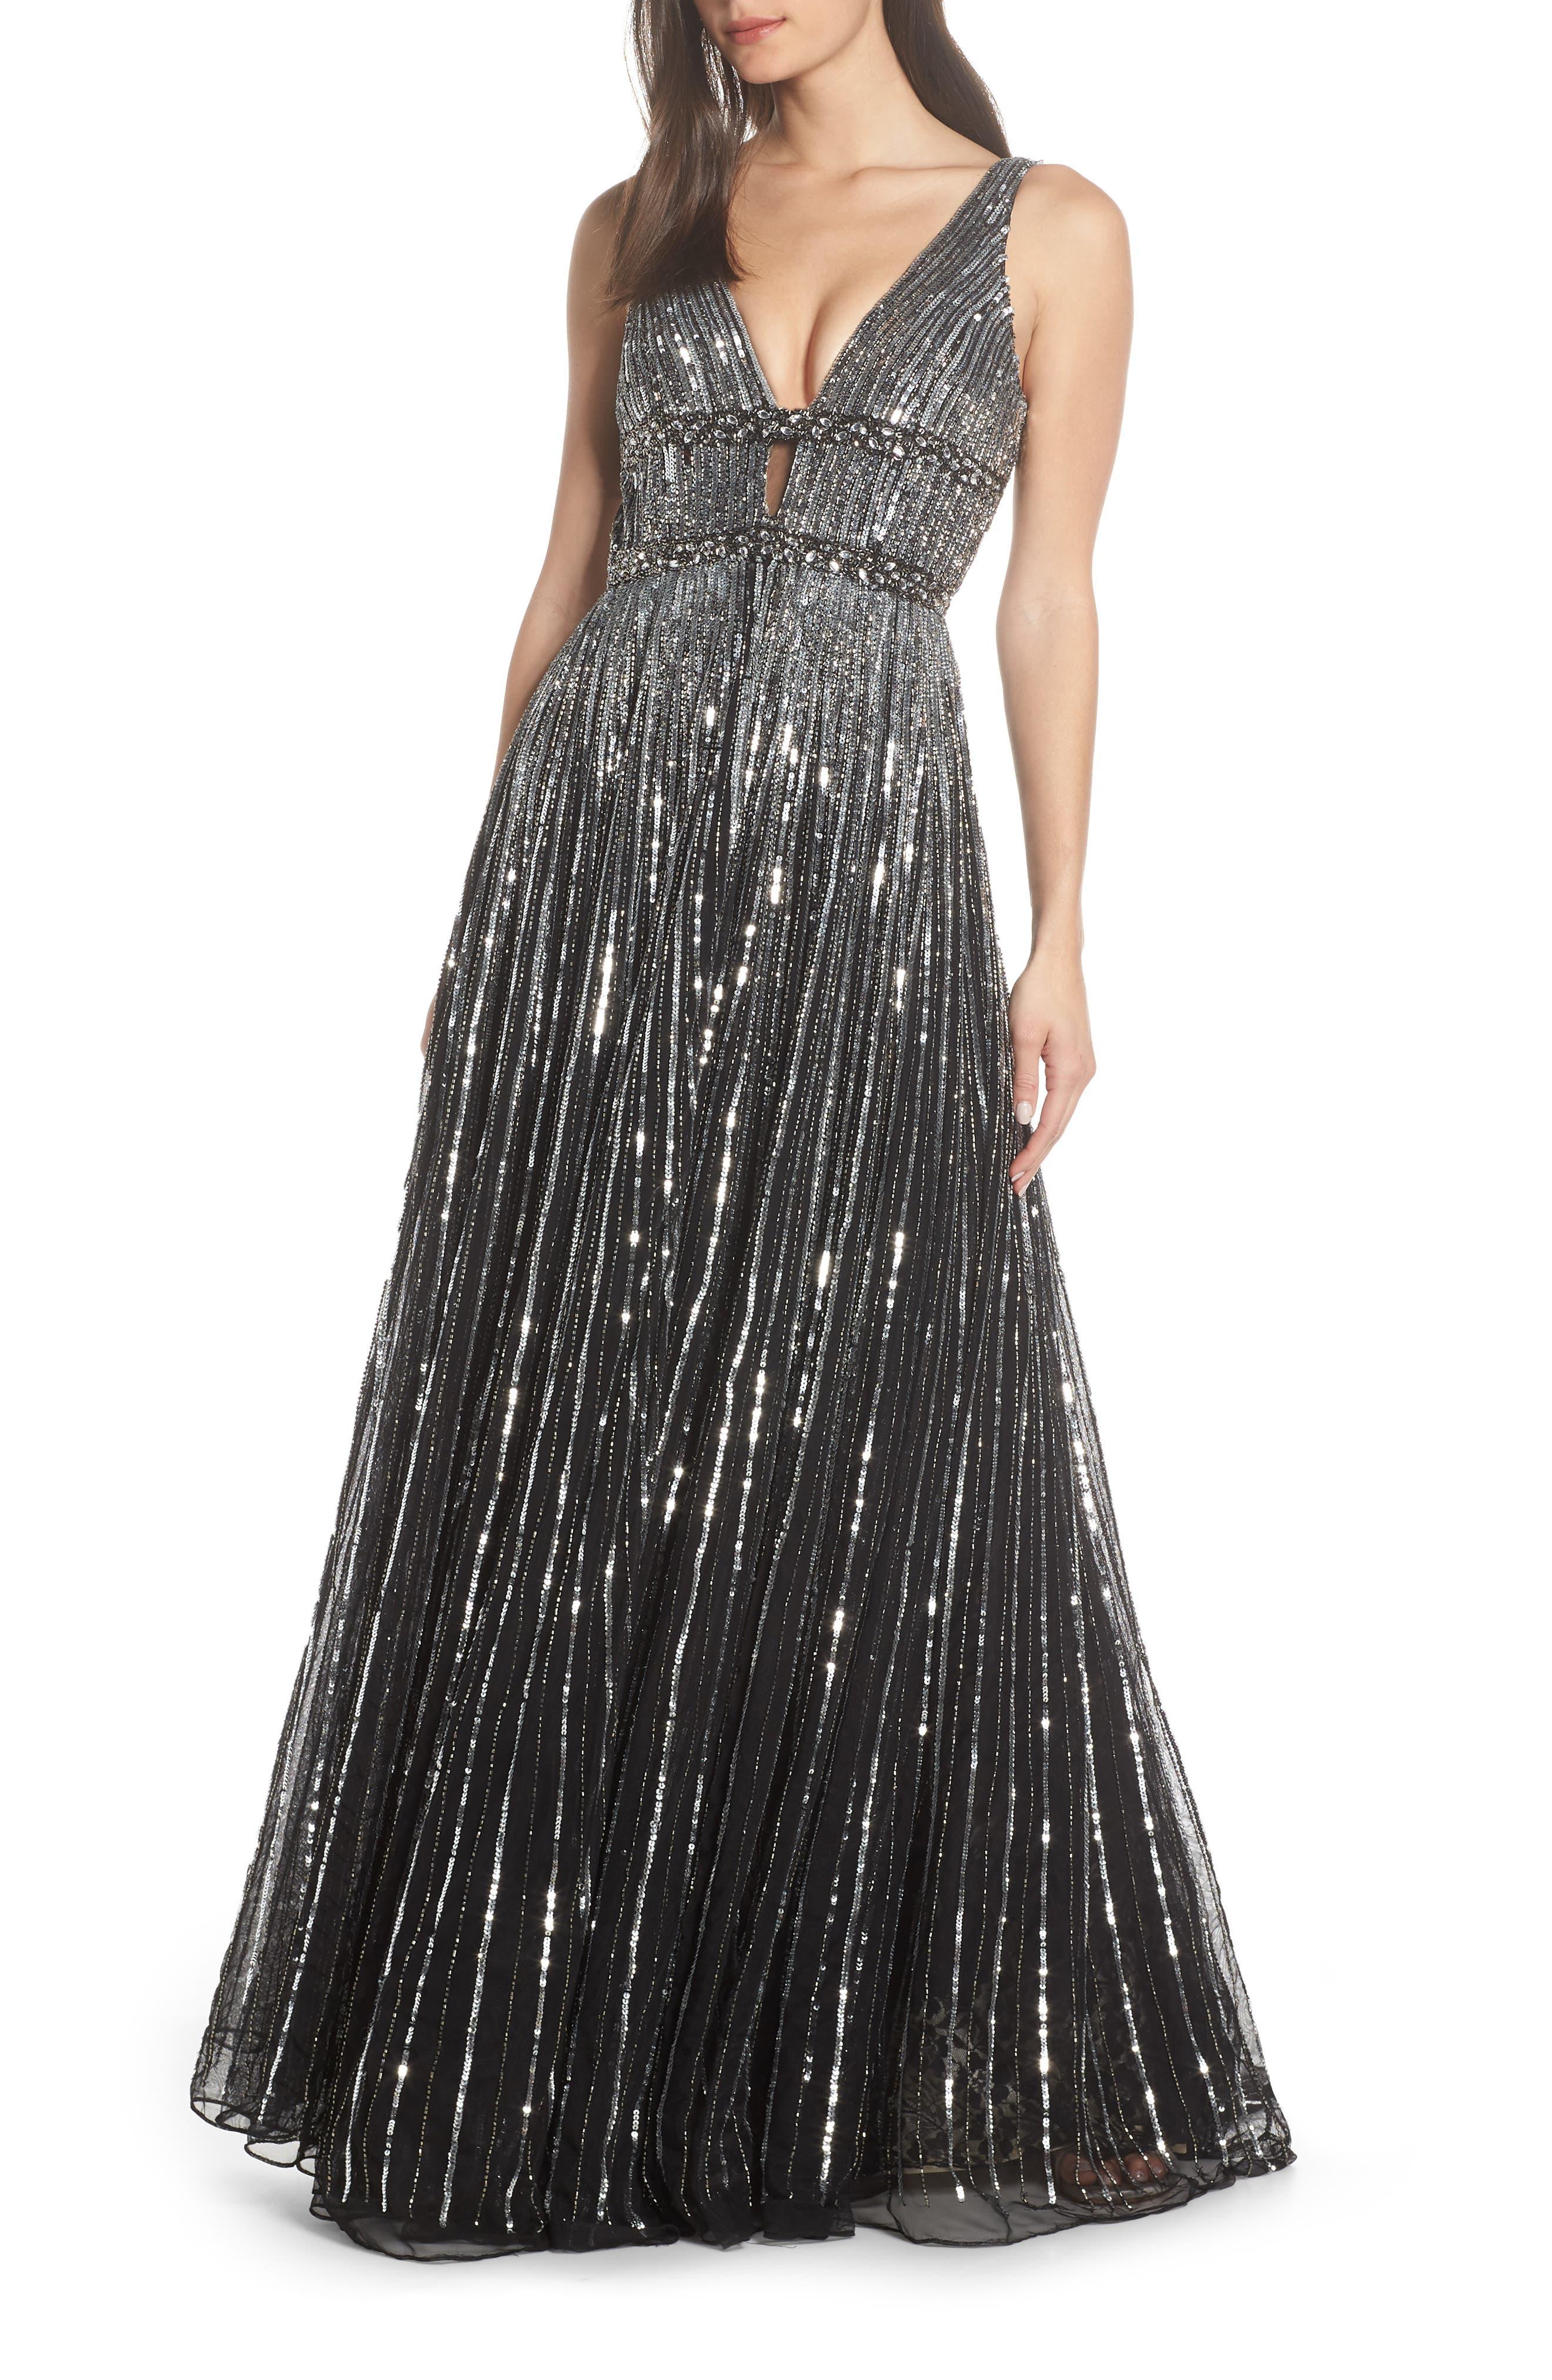 MAC DUGGAL, Deep V-Neck Sequin Stripe Gown, Main thumbnail 1, color, BLACK SILVER